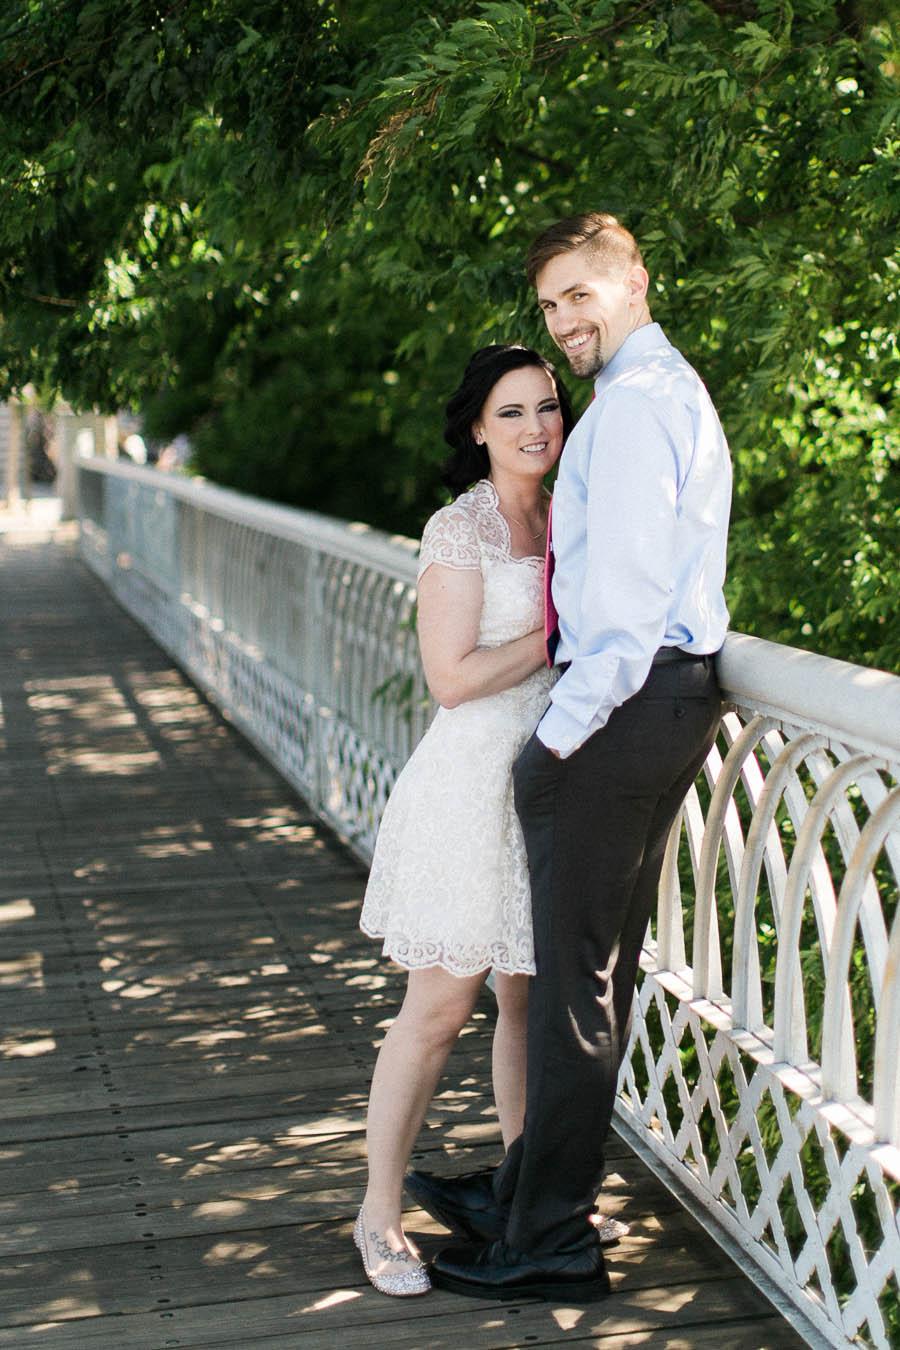 chattanooga film wedding photographer documentary natural gentle real life ©2016abigailbobophotography-22.jpg